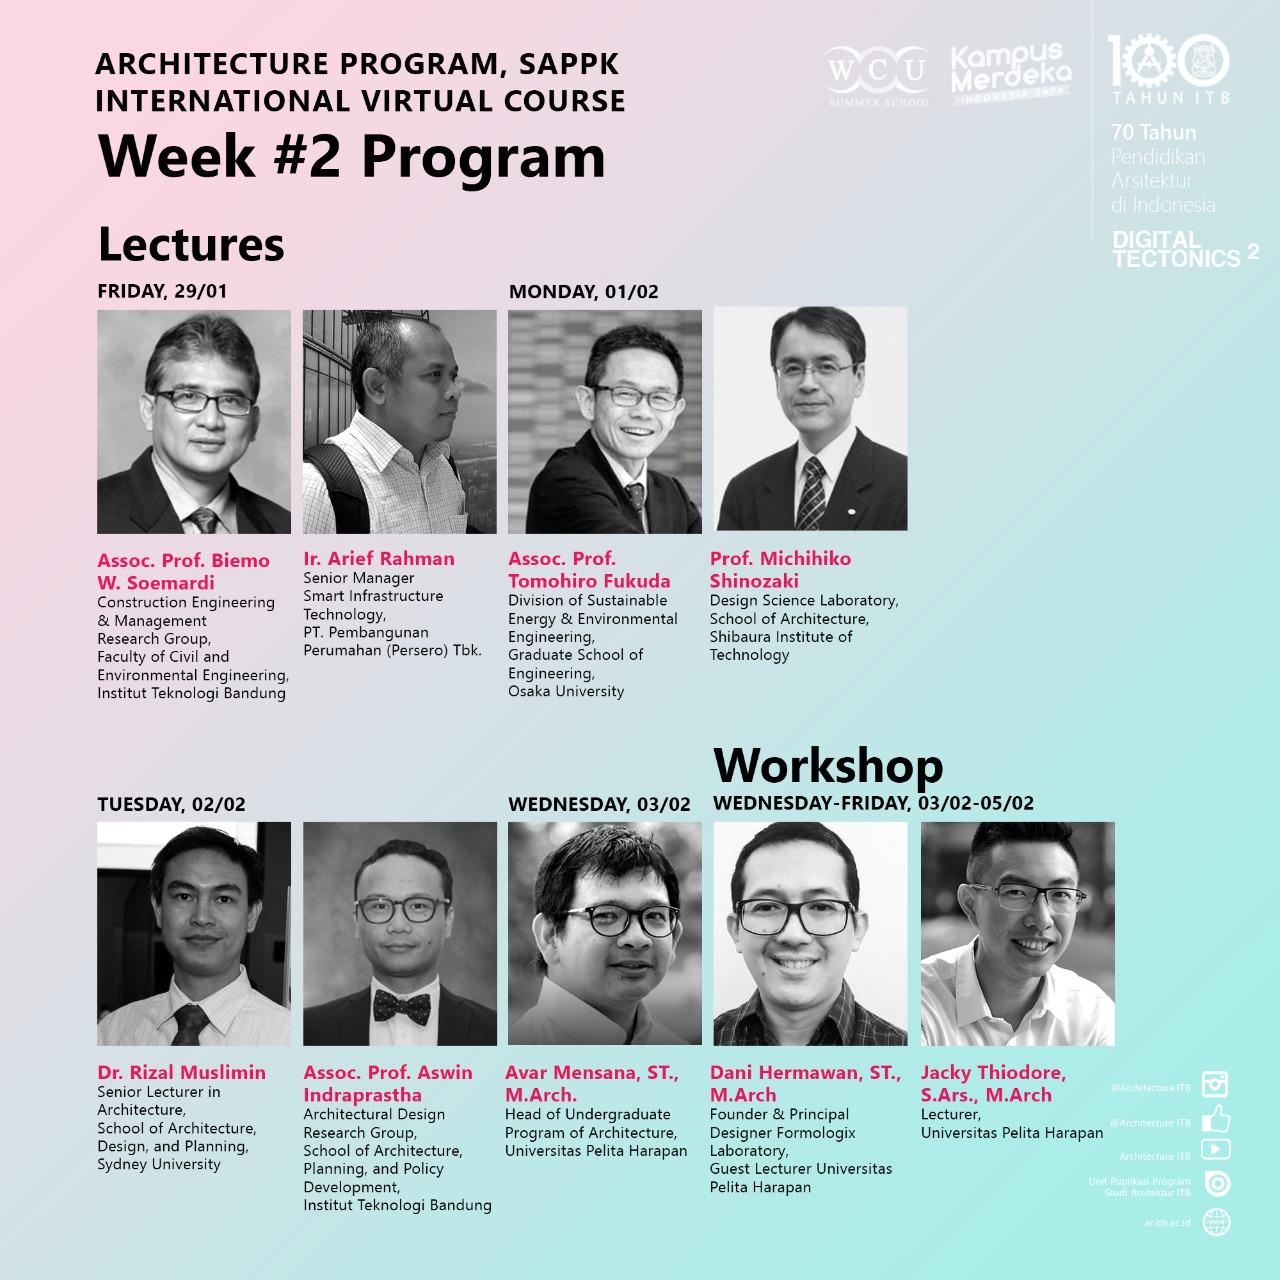 International Virtual Course Week #2 Program